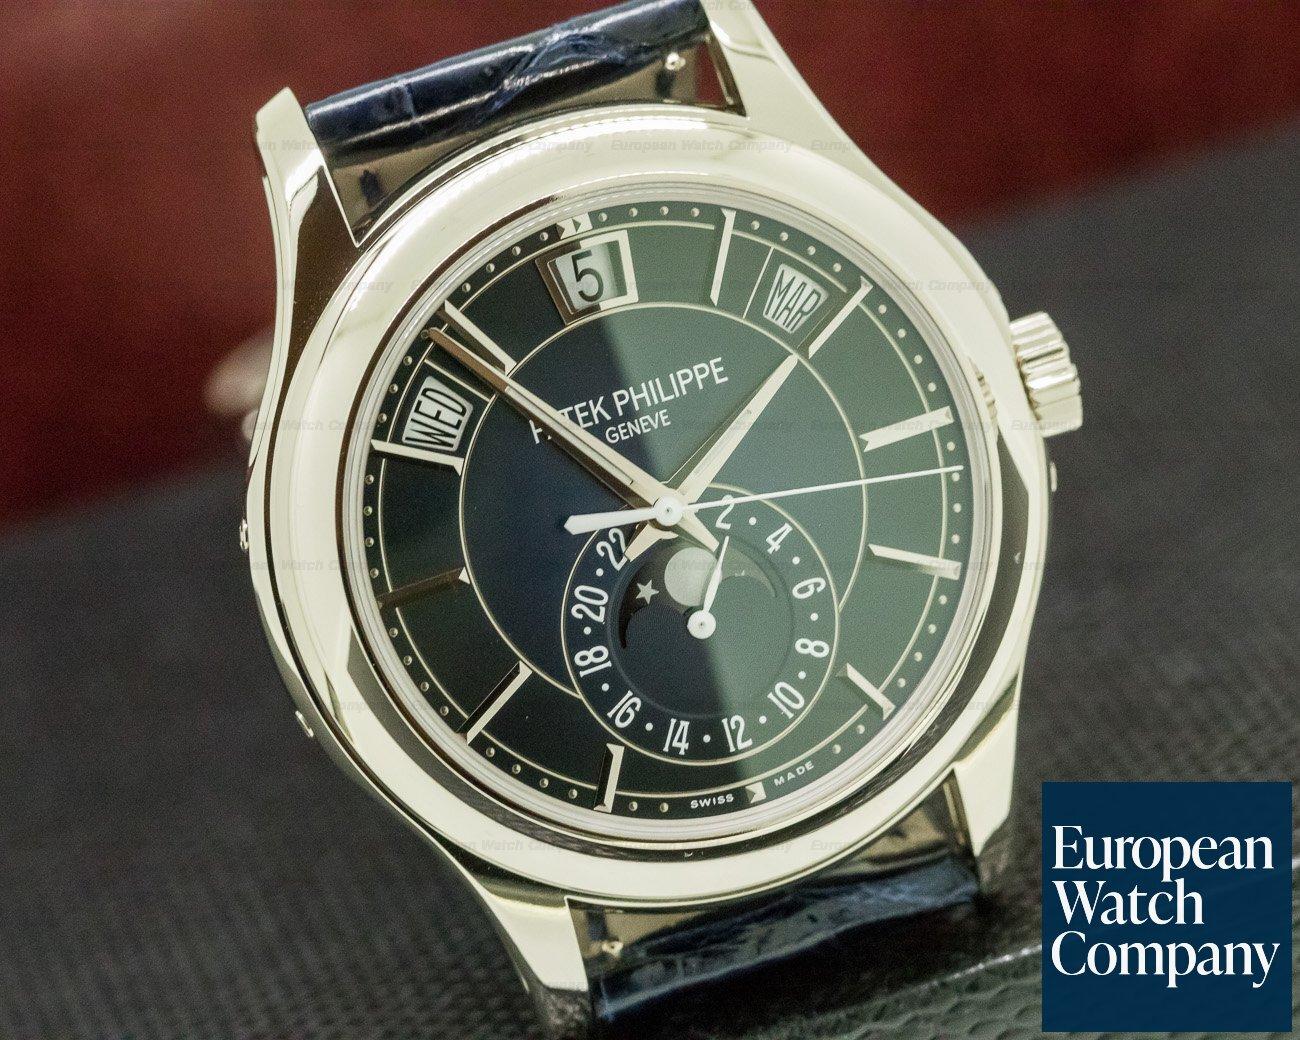 Patek Philippe 5205G-013 Annual Calendar Blue Dial 18K White Gold UNWORN